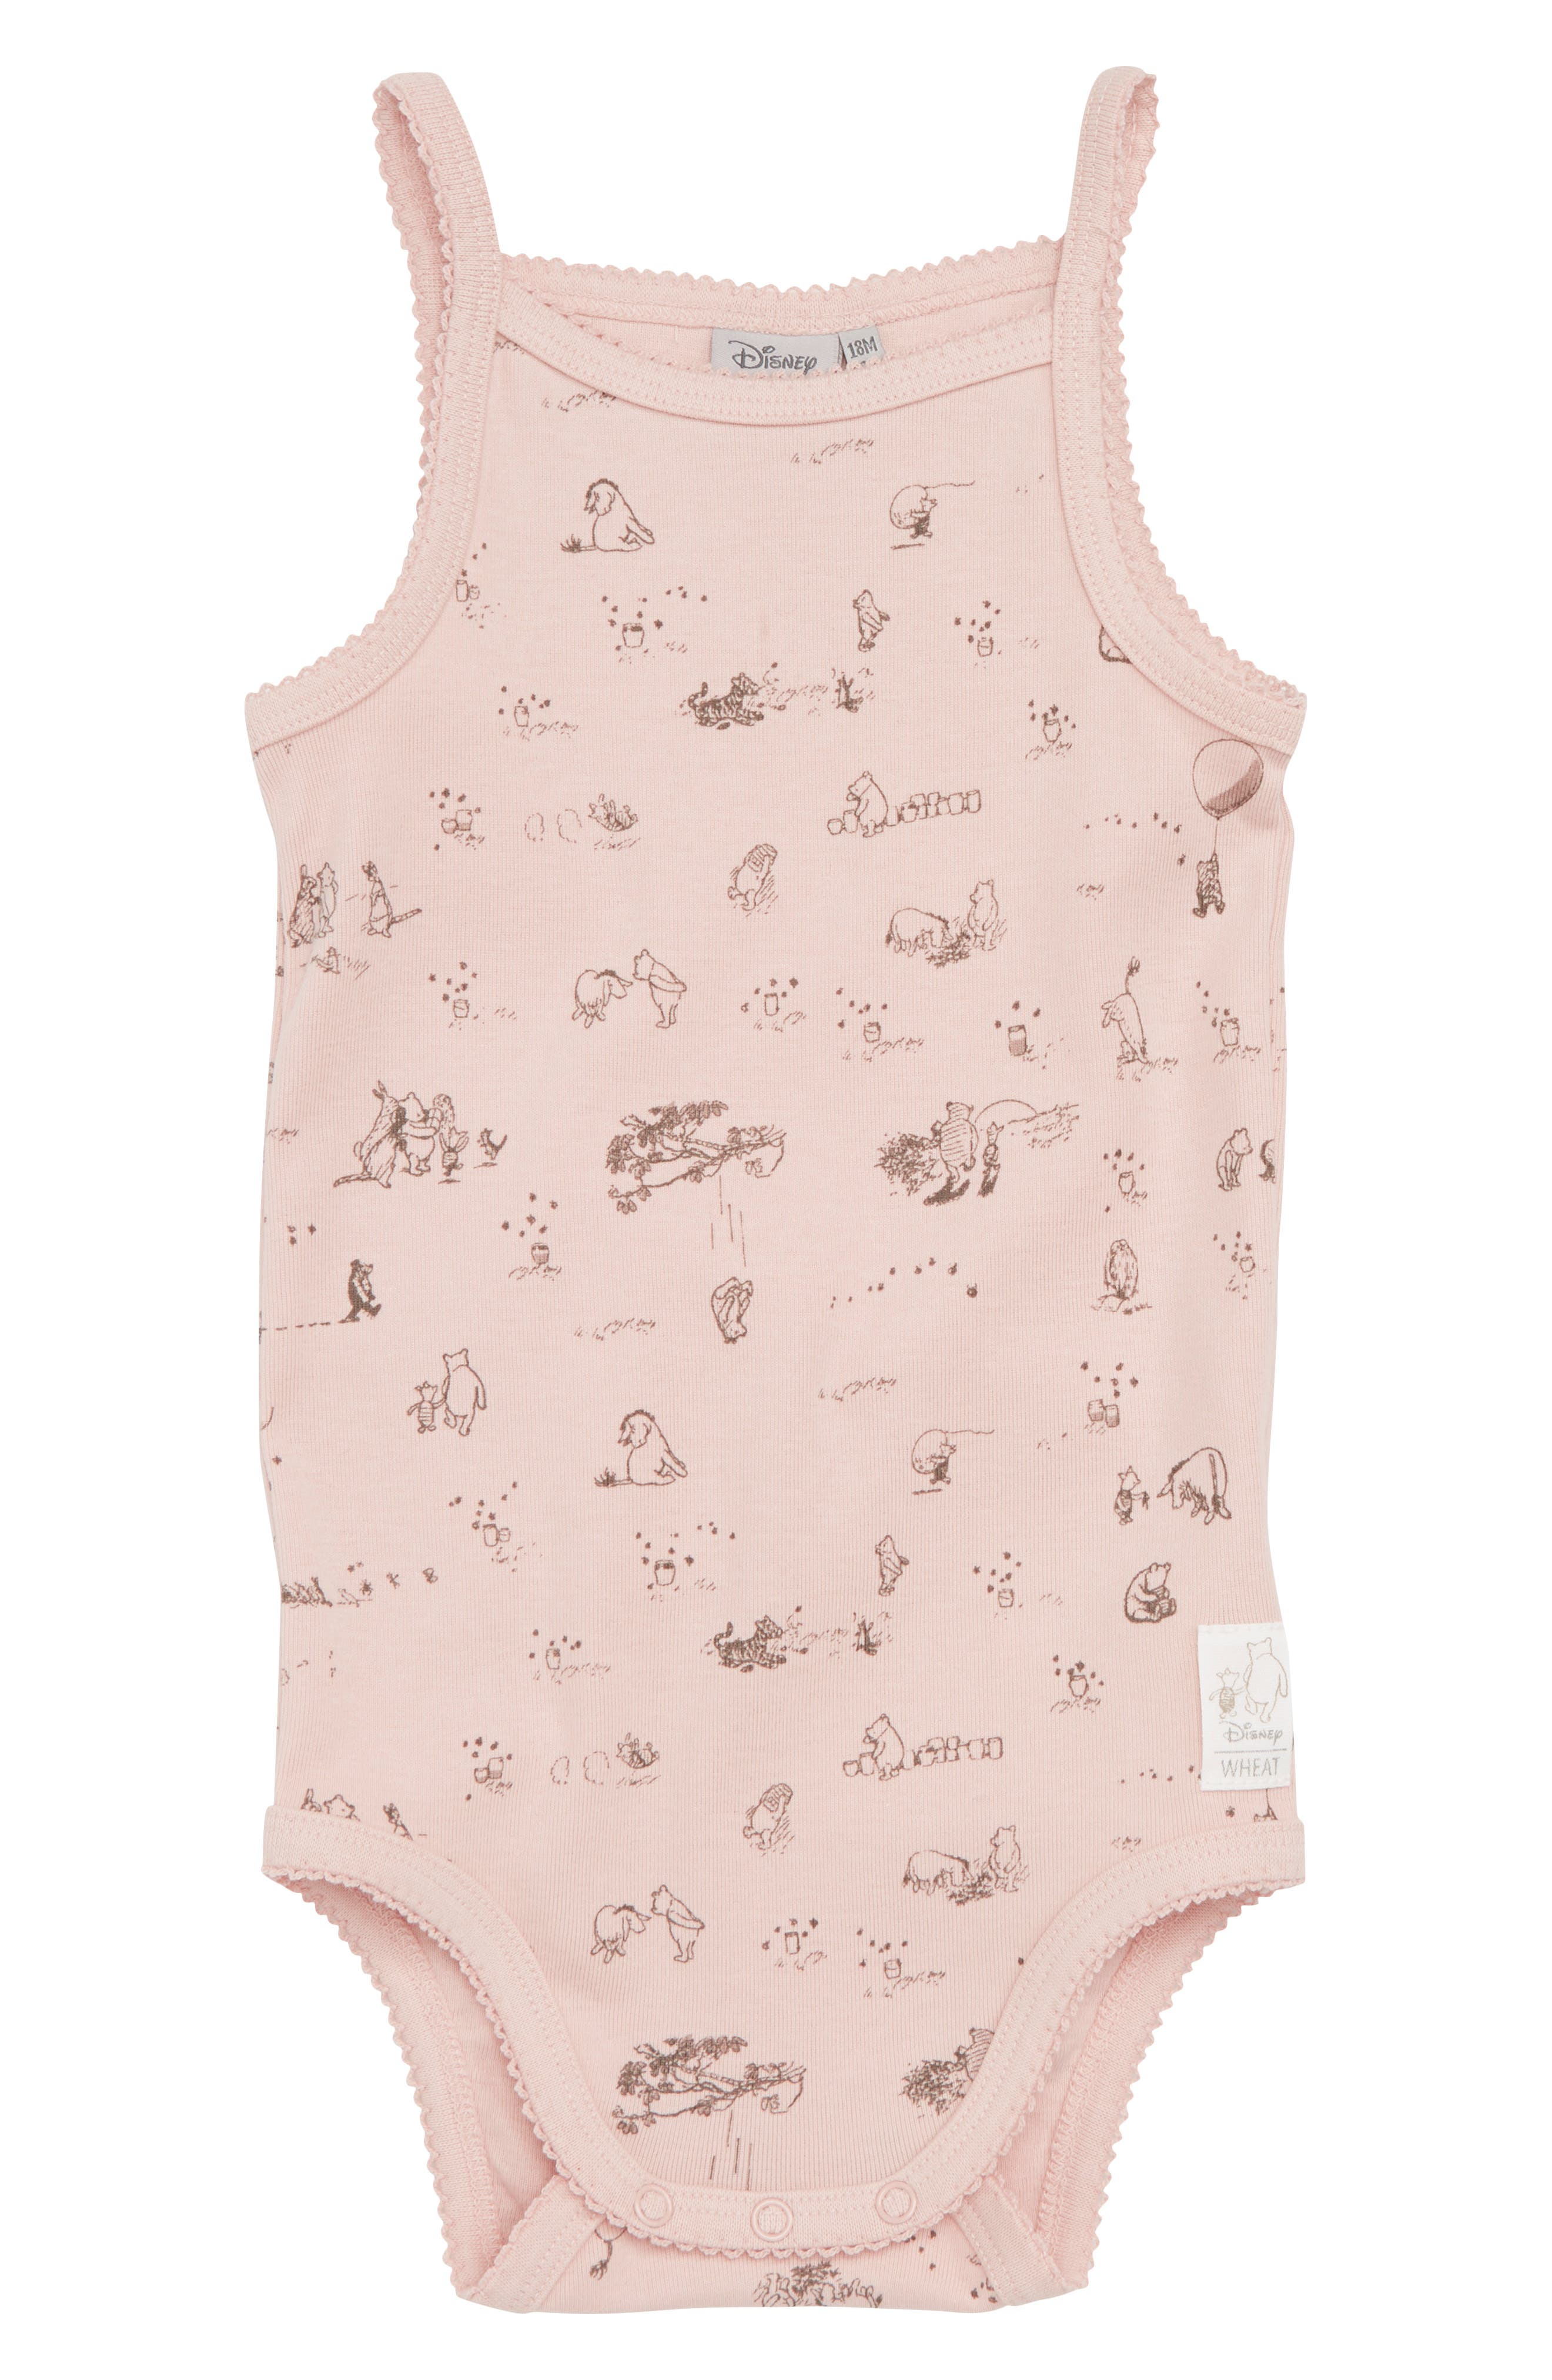 x Disney<sup>®</sup> Winnie the Pooh Organic Cotton Bodysuit,                         Main,                         color, Powder